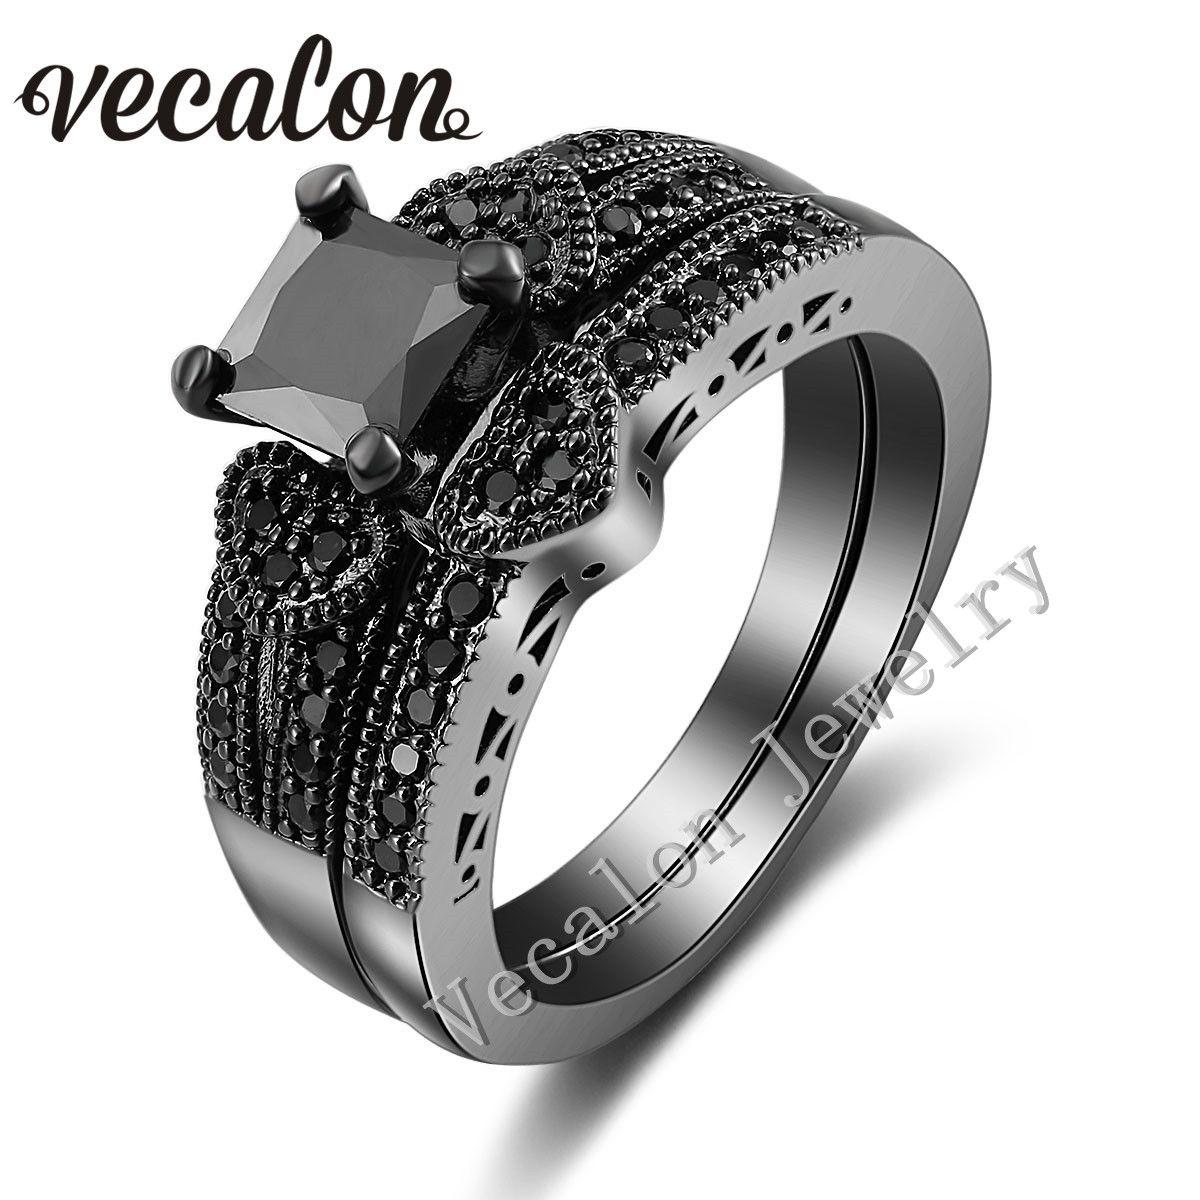 2018 Vecalon Heart Jewelry Women Engagement Wedding Band Ring Set